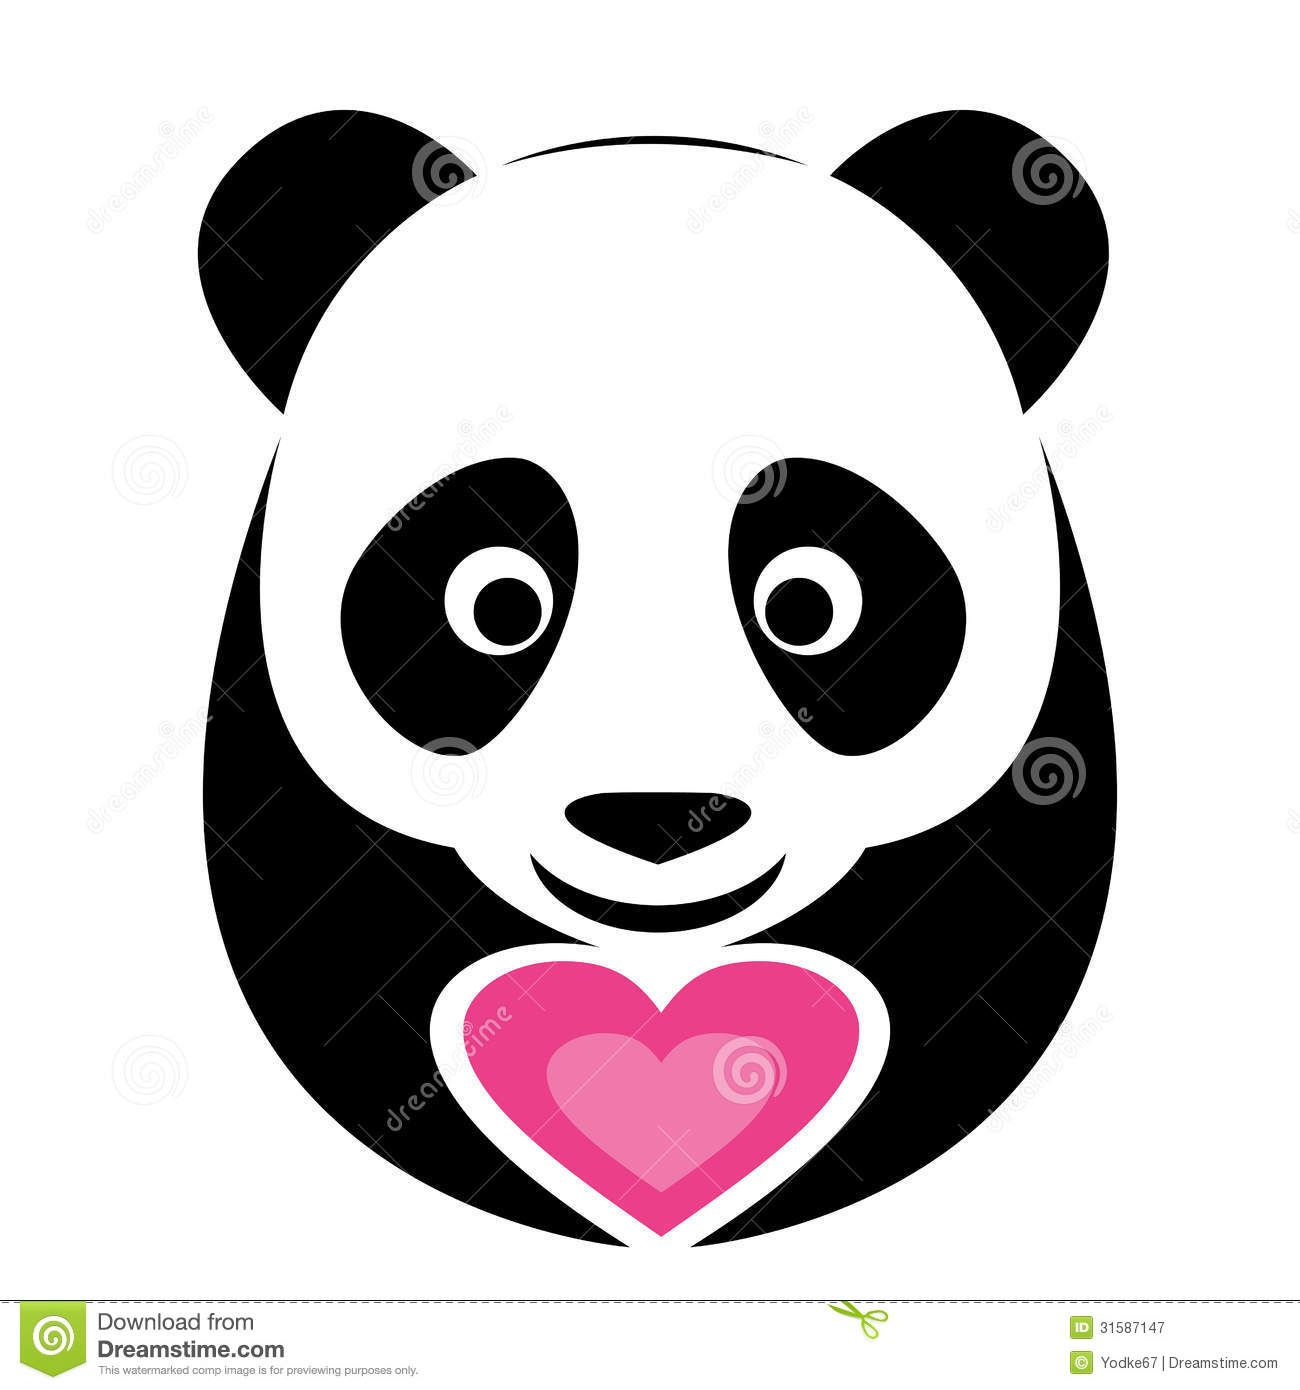 Clipart Panda Face Vector Image Of An Panda And